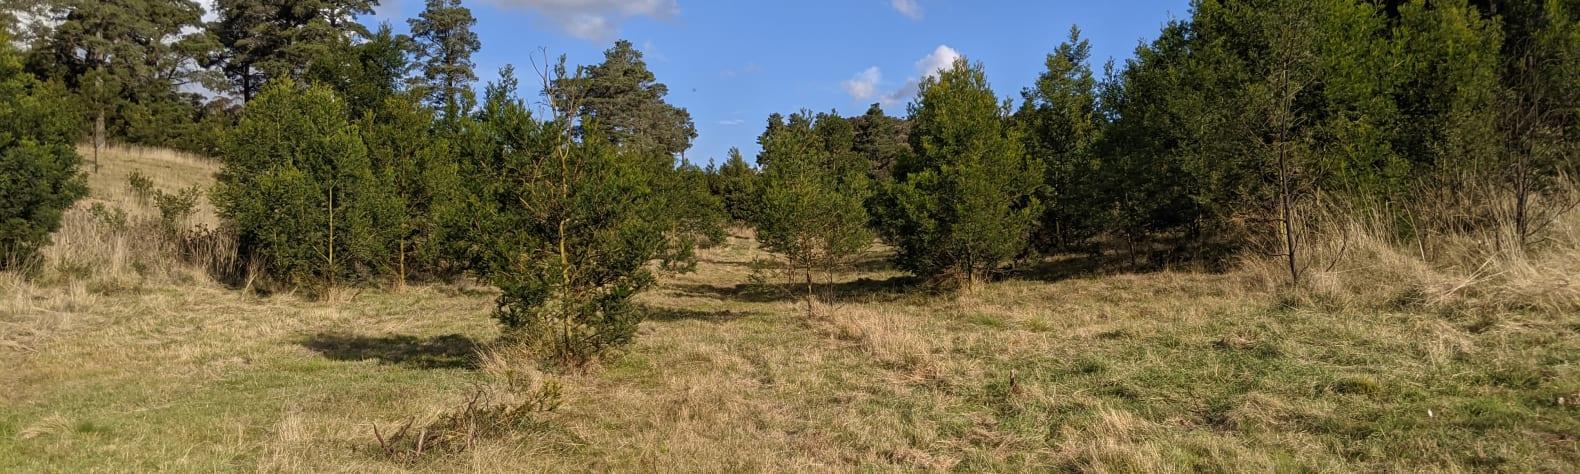 Pinebank Farm